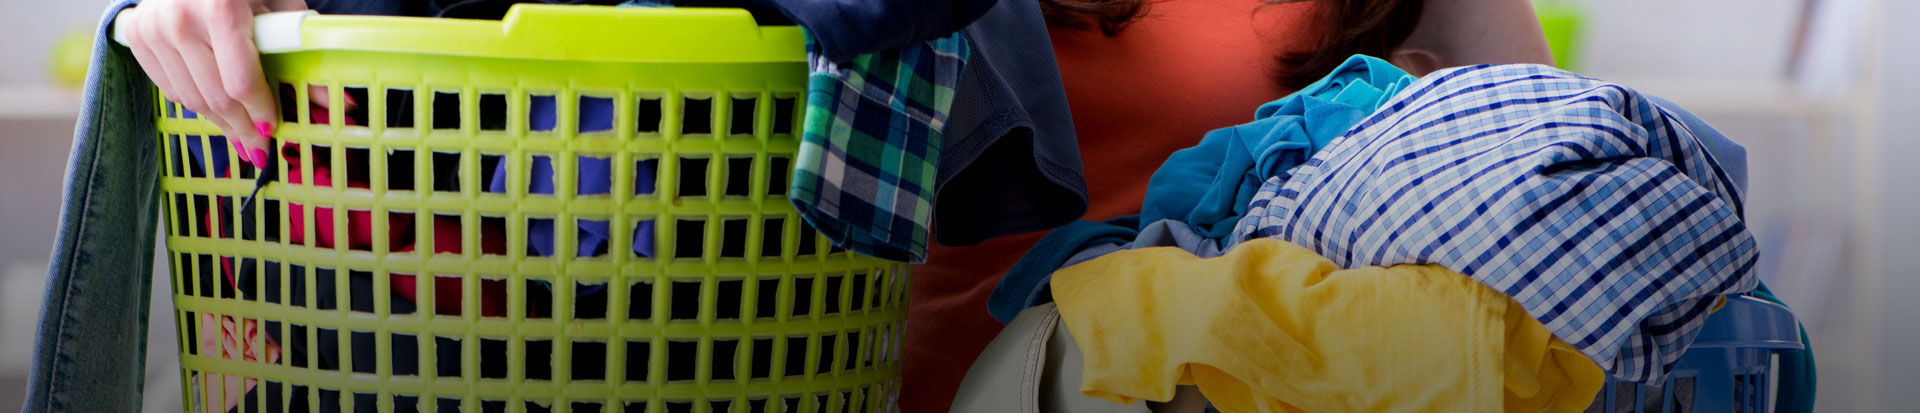 Home Care & Laundry Shrink Sleeves Header